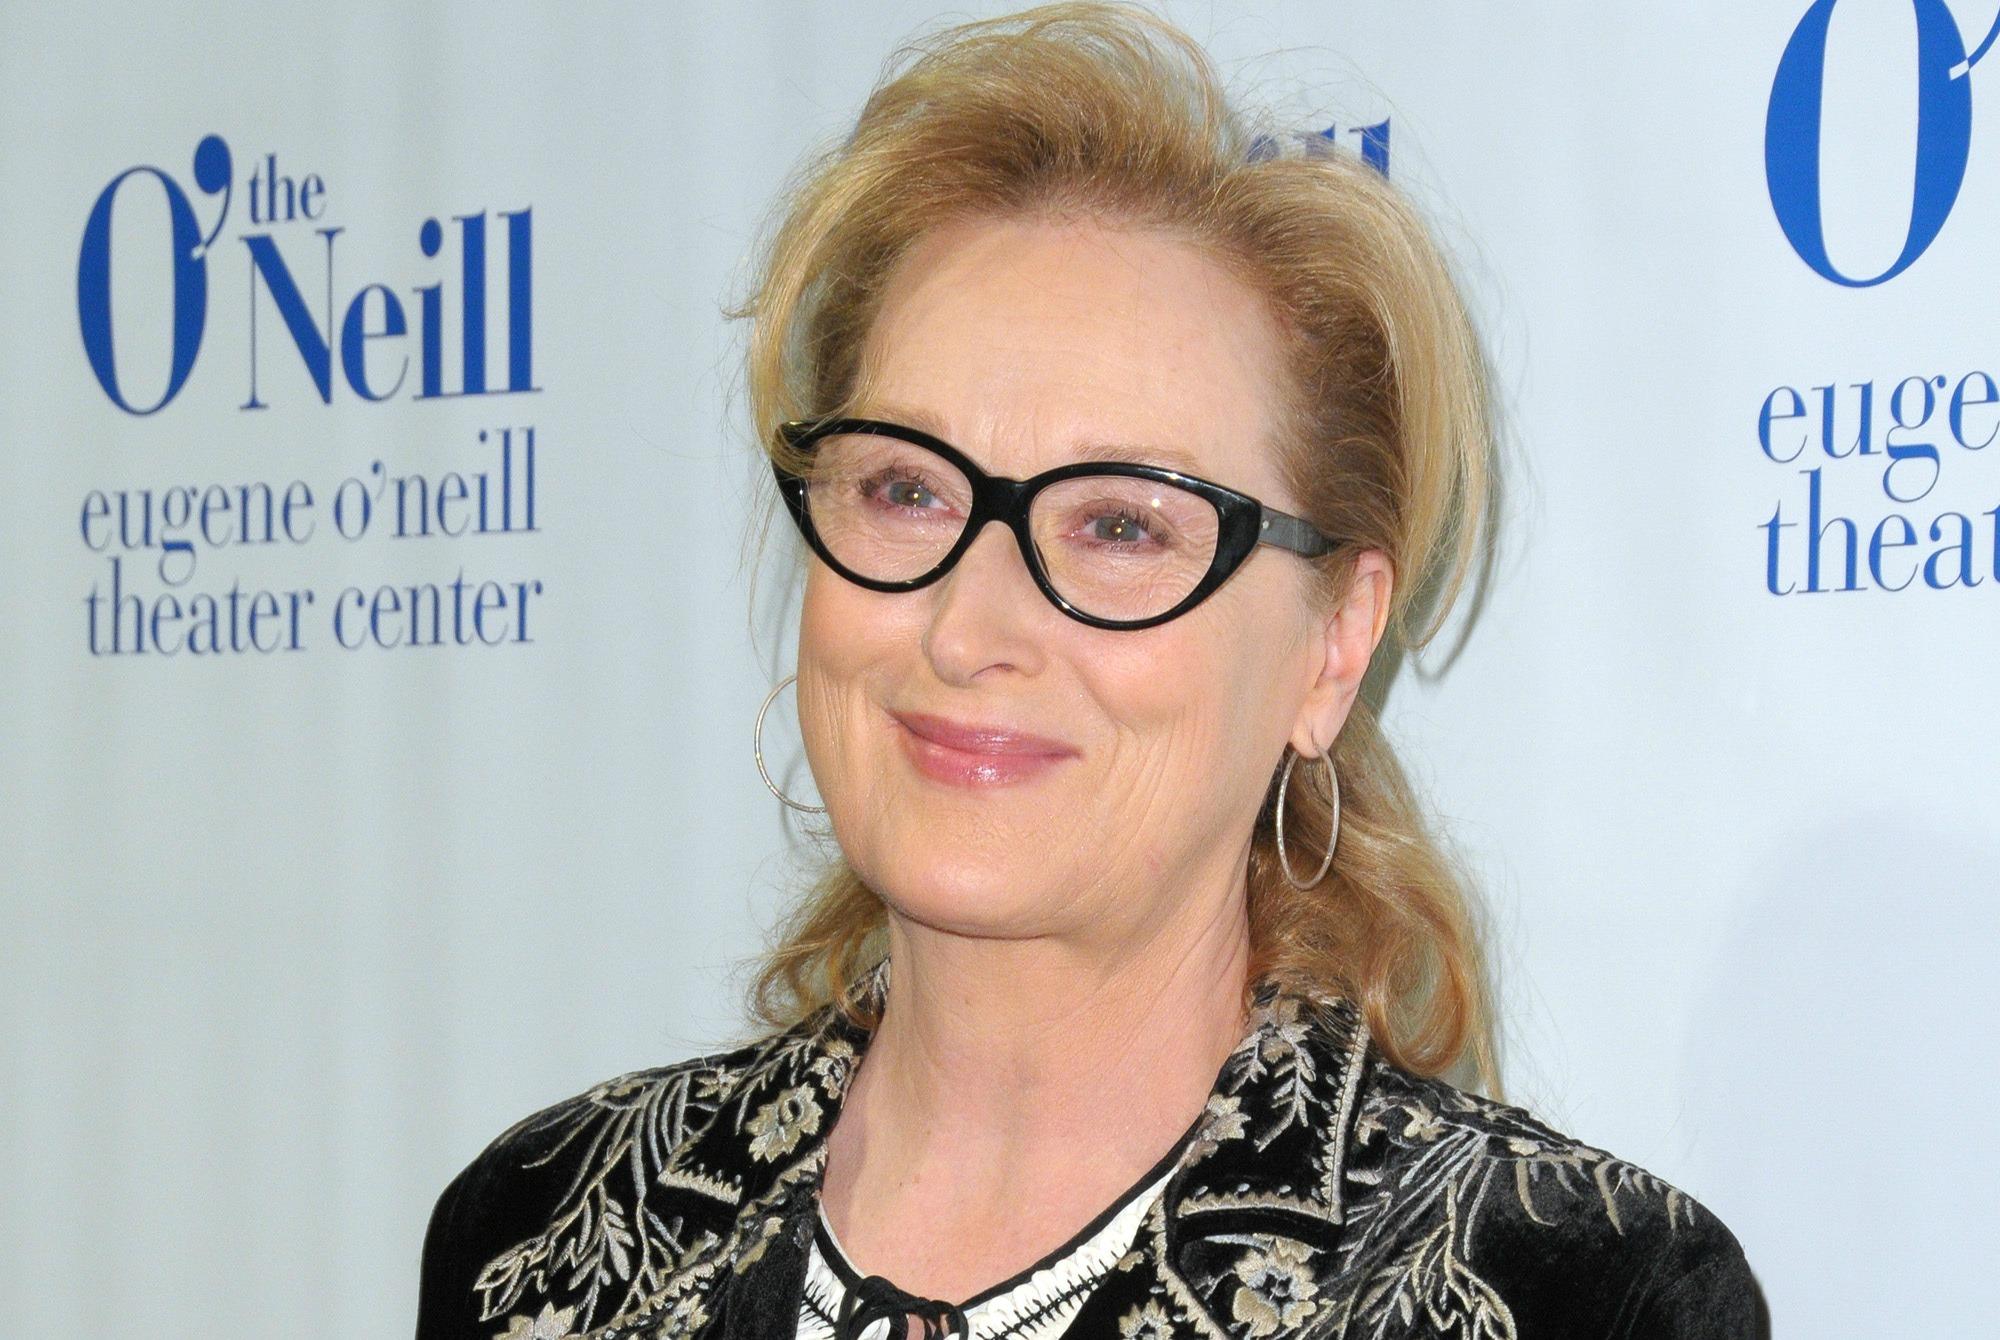 Meryl Streep honorary doctorate degree from Indiana University speech